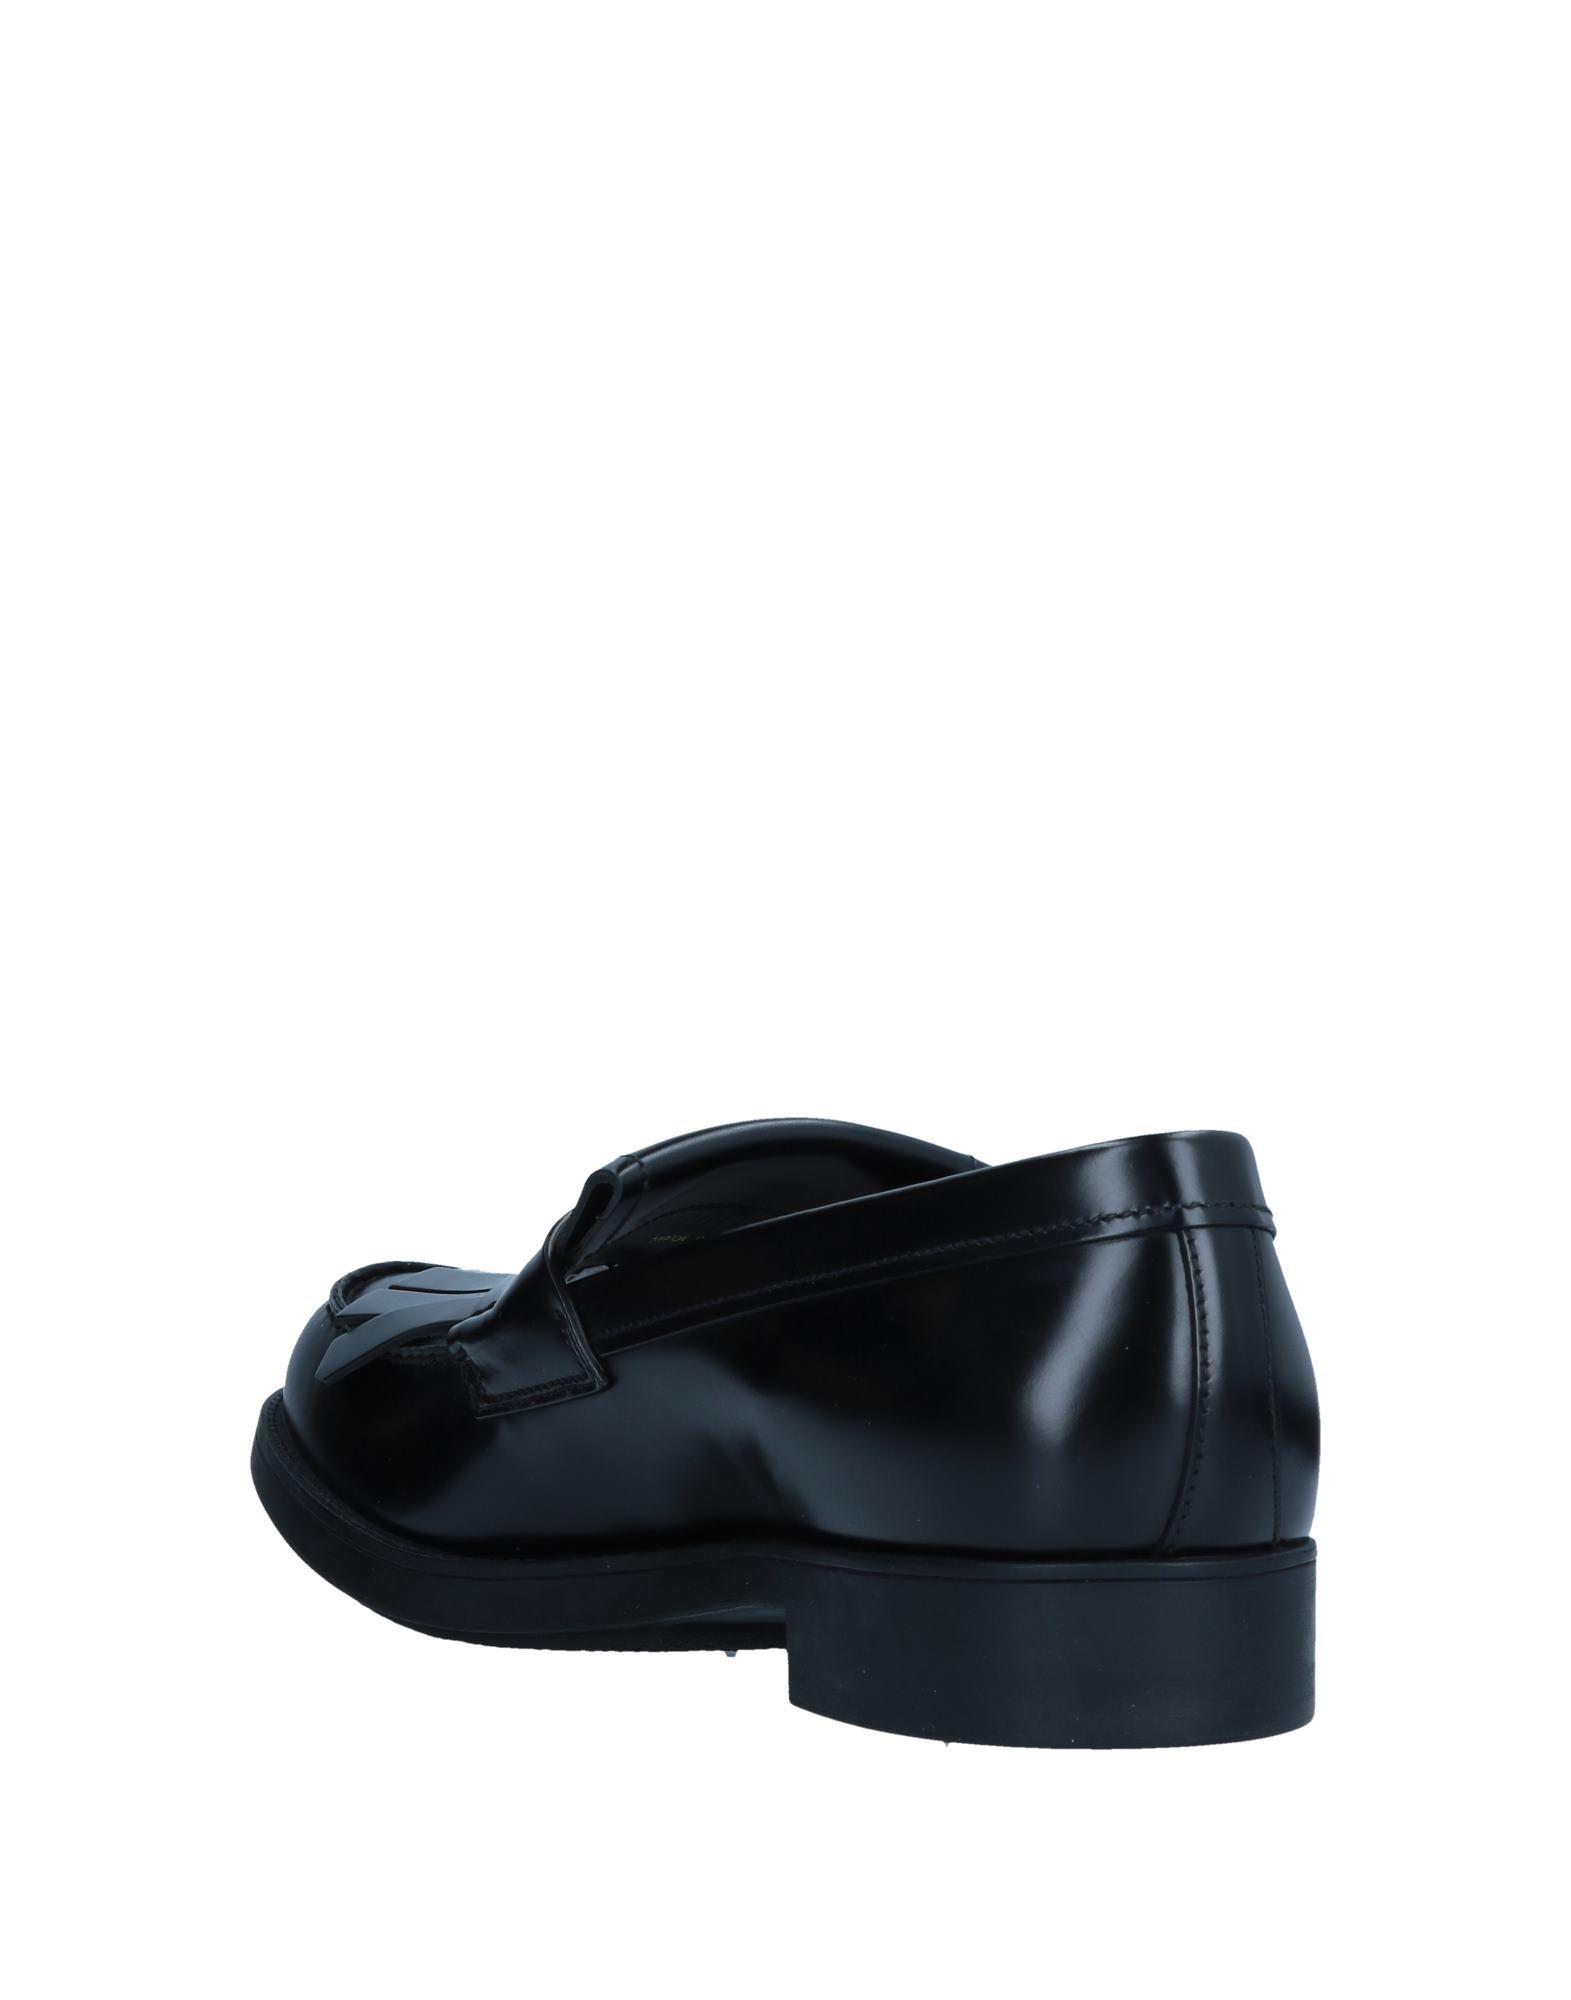 Prada Mokassins Herren  11544235WO Gute Qualität beliebte Schuhe